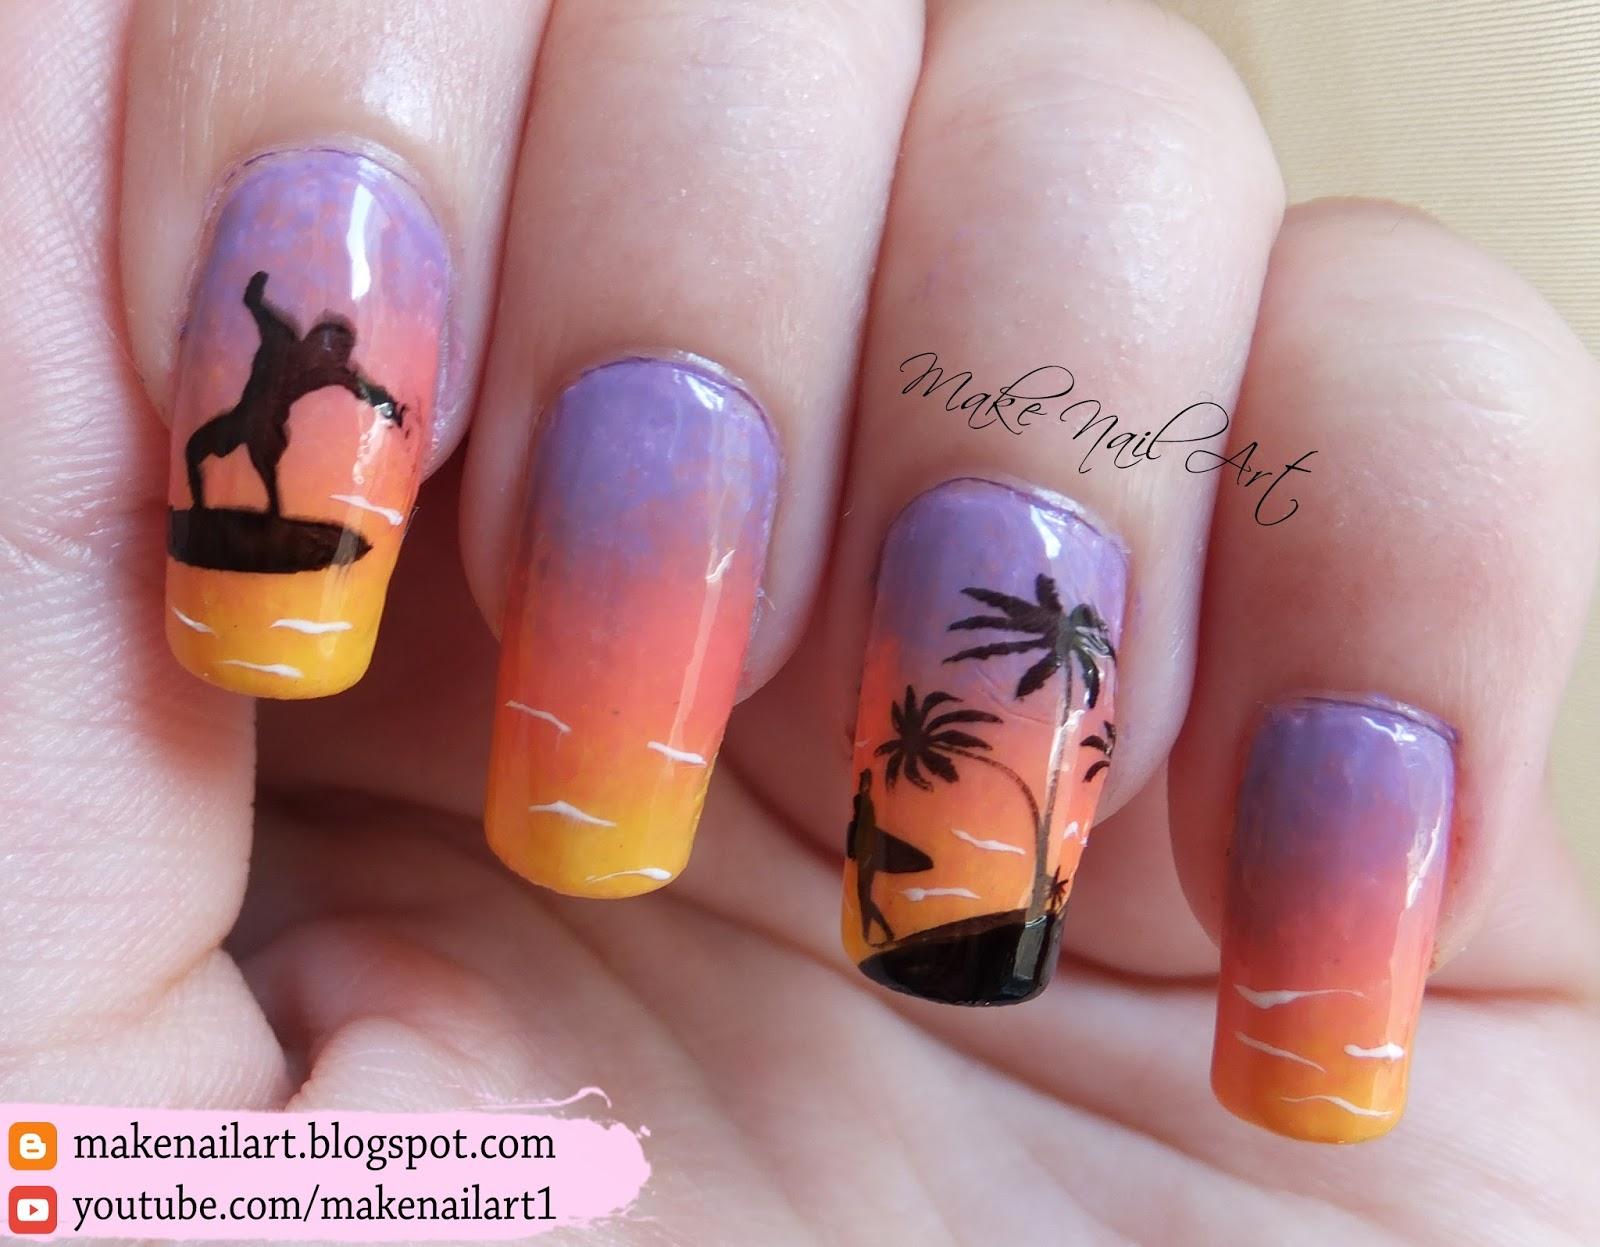 Make Nail Art: July 2016